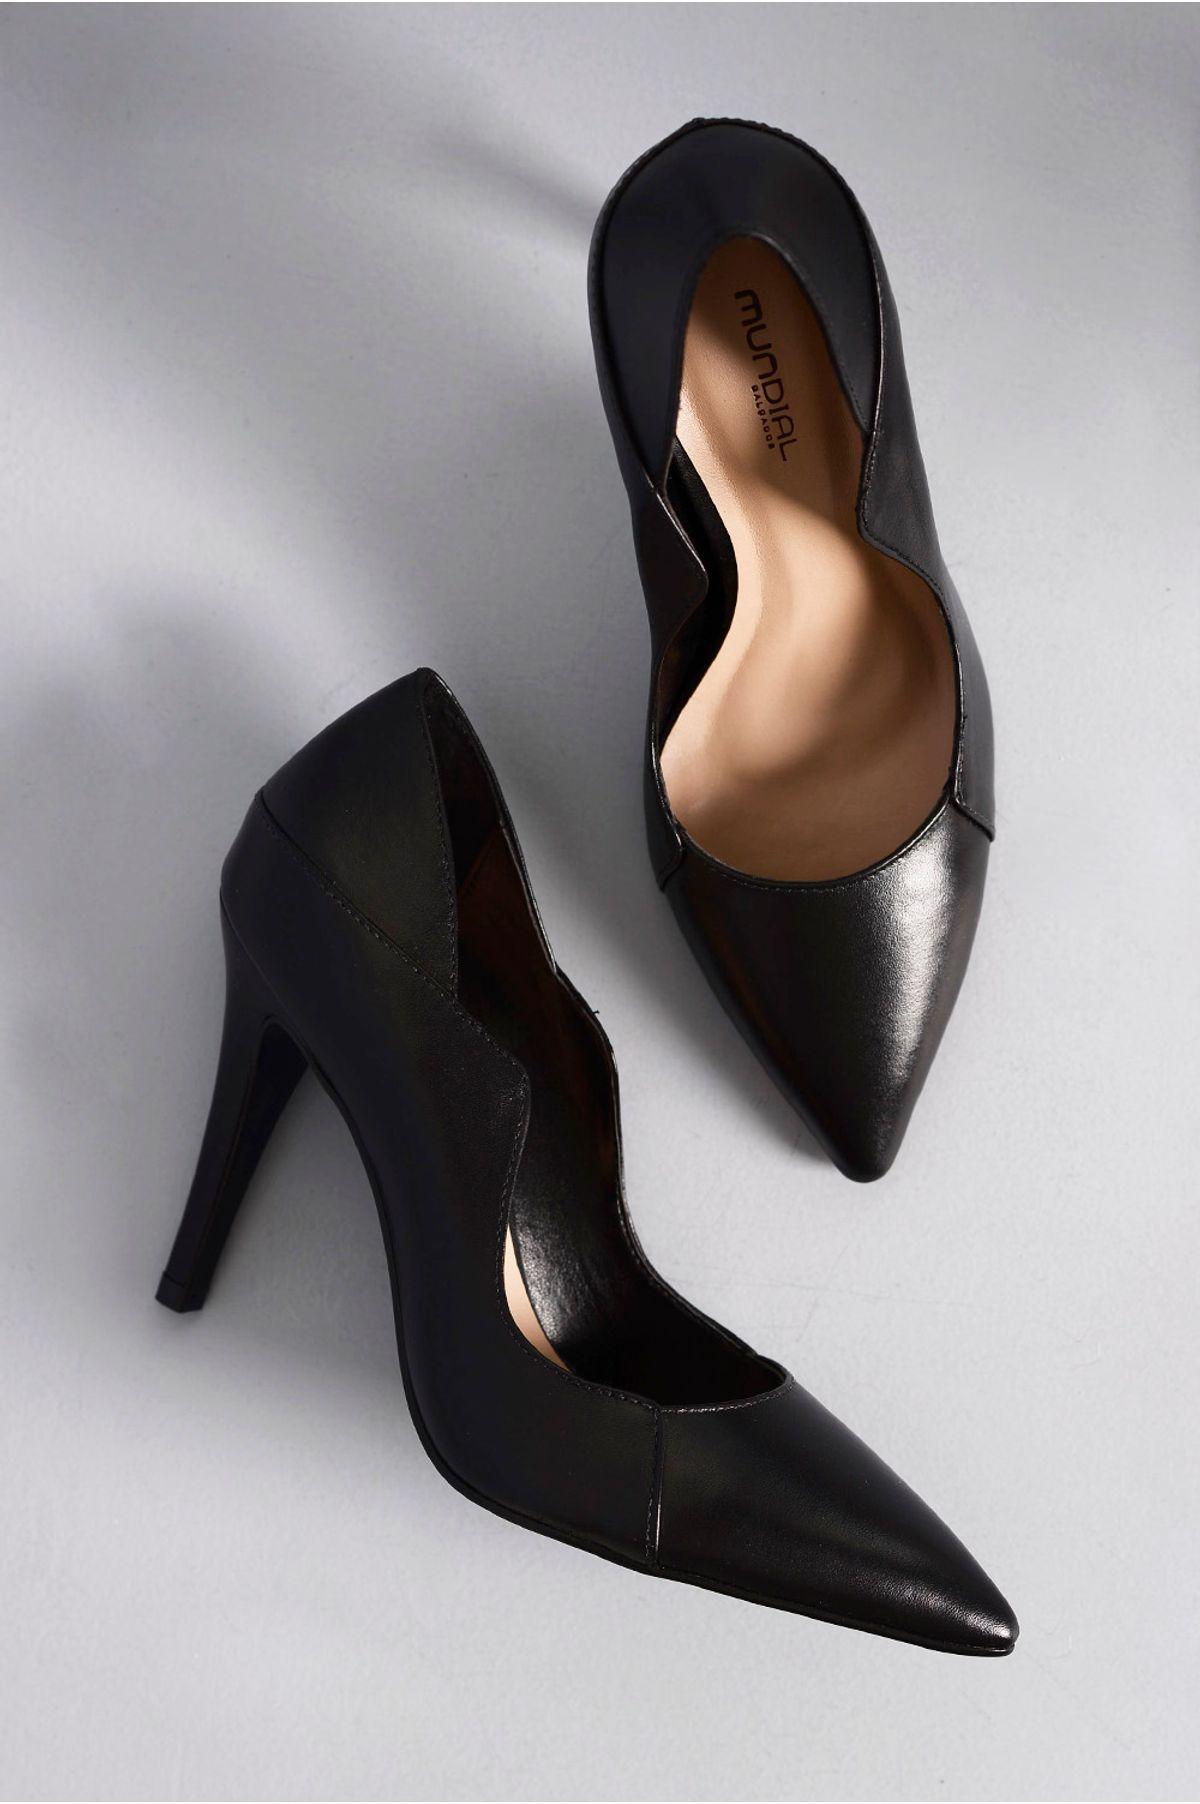 5c36c0710c Scarpin Feminino Salto Alto Faye Mundial CR-PRETO - Mundial Calçados